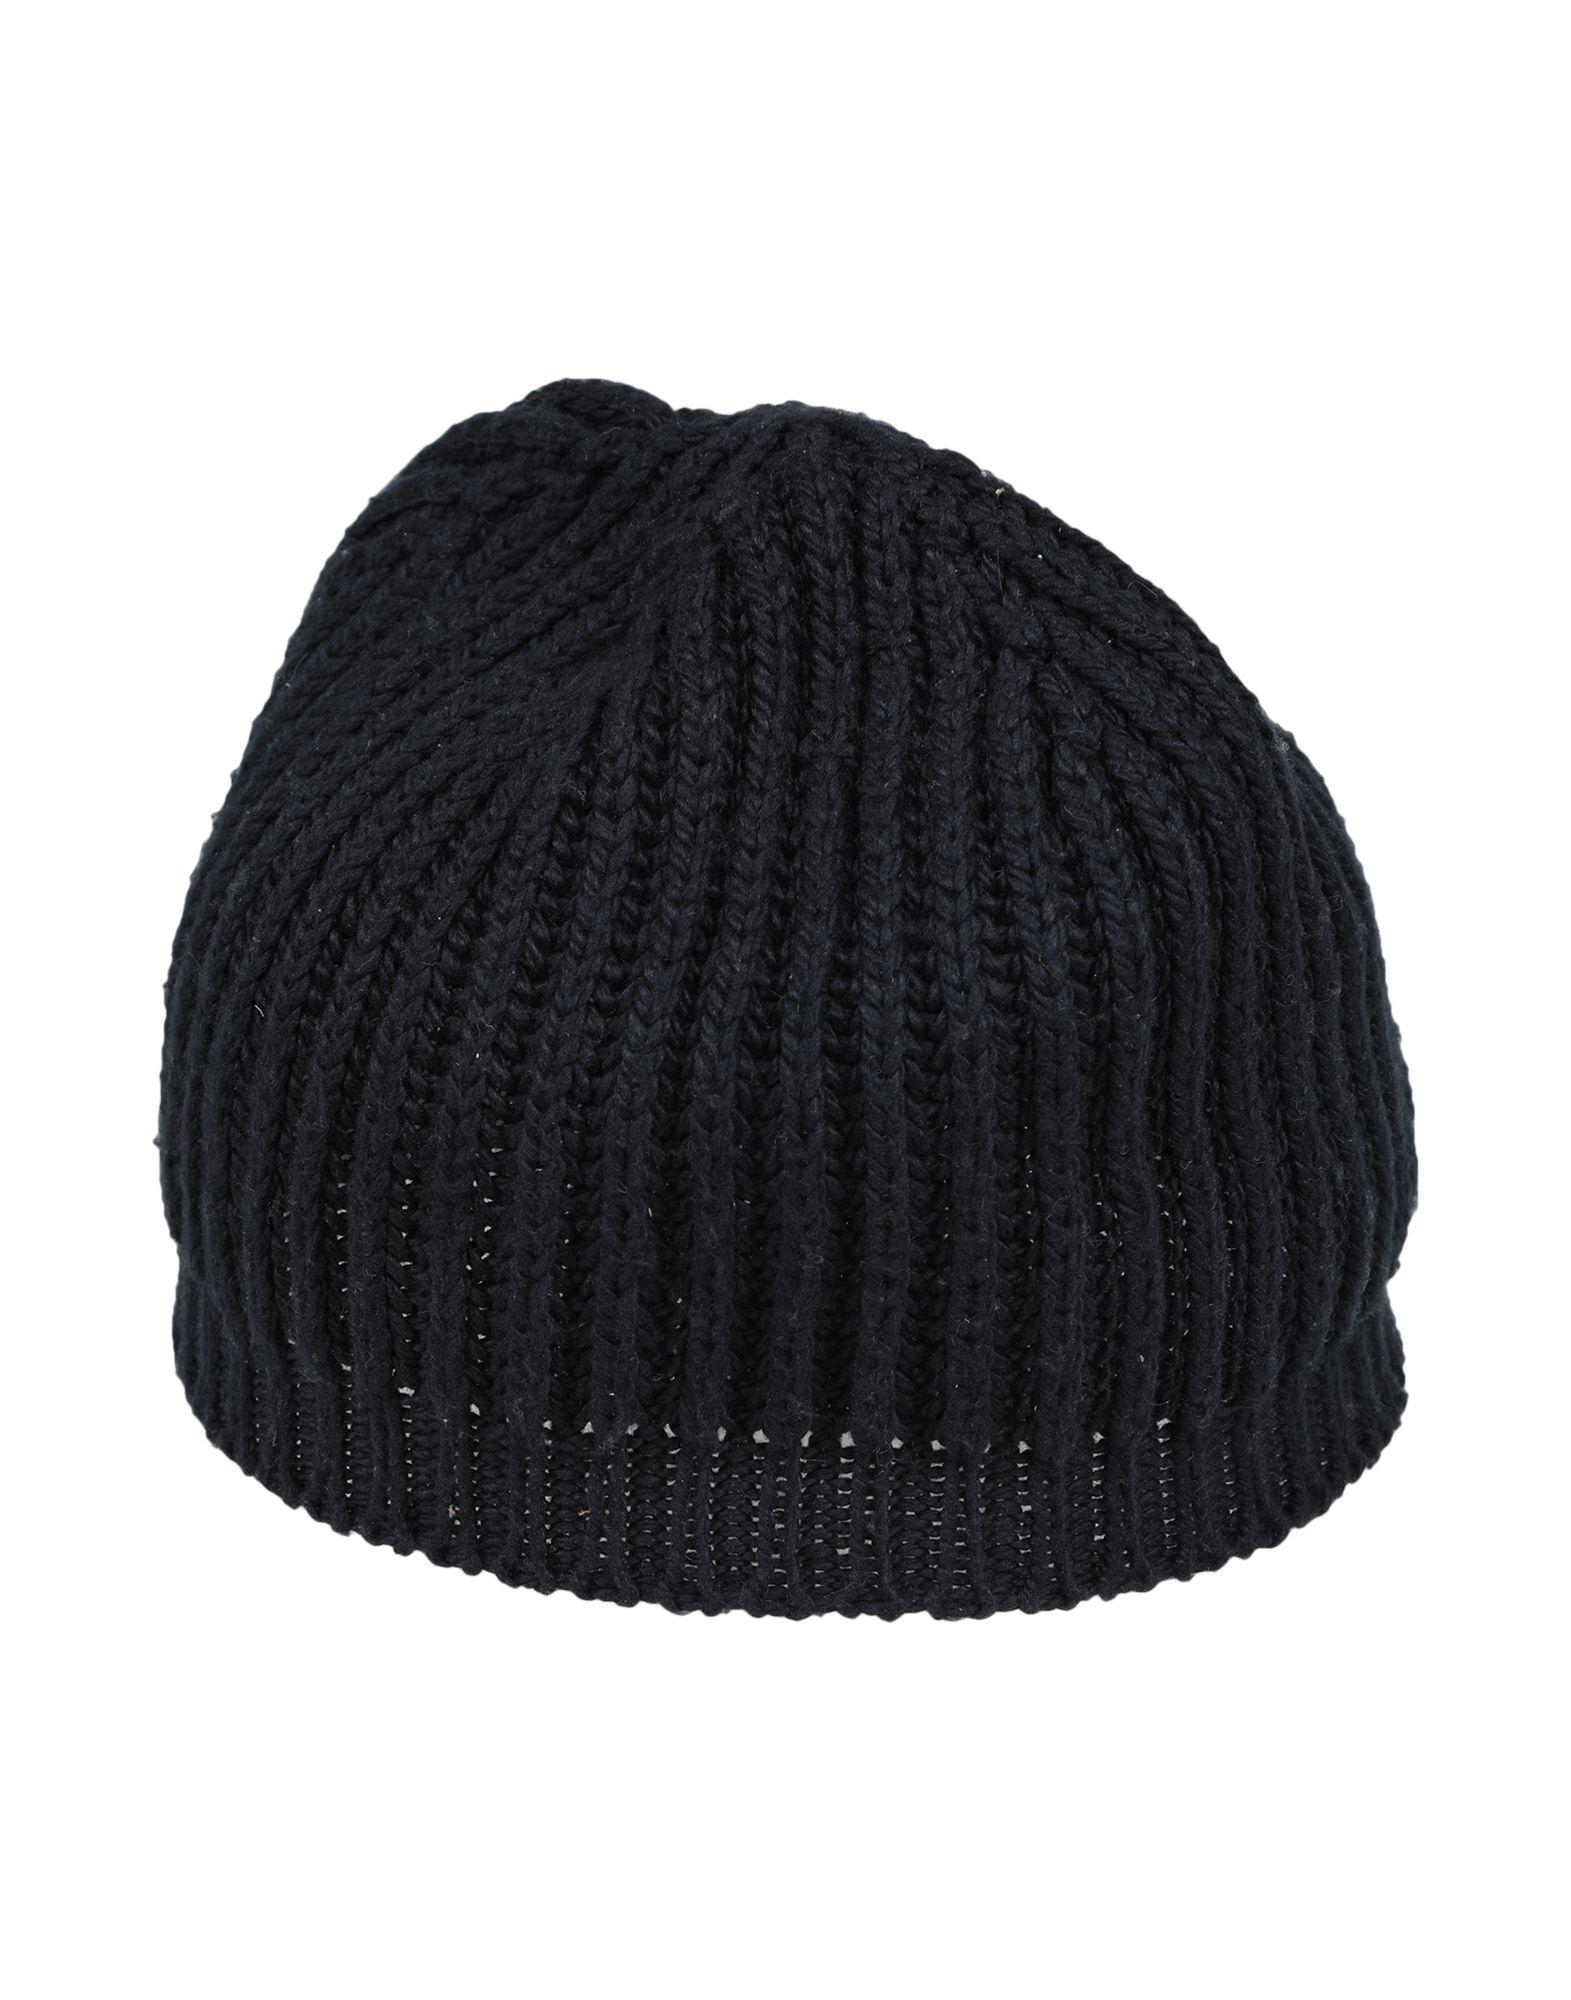 fc1dc9722b8c2 Lyst - Rick Owens Hat in Black for Men